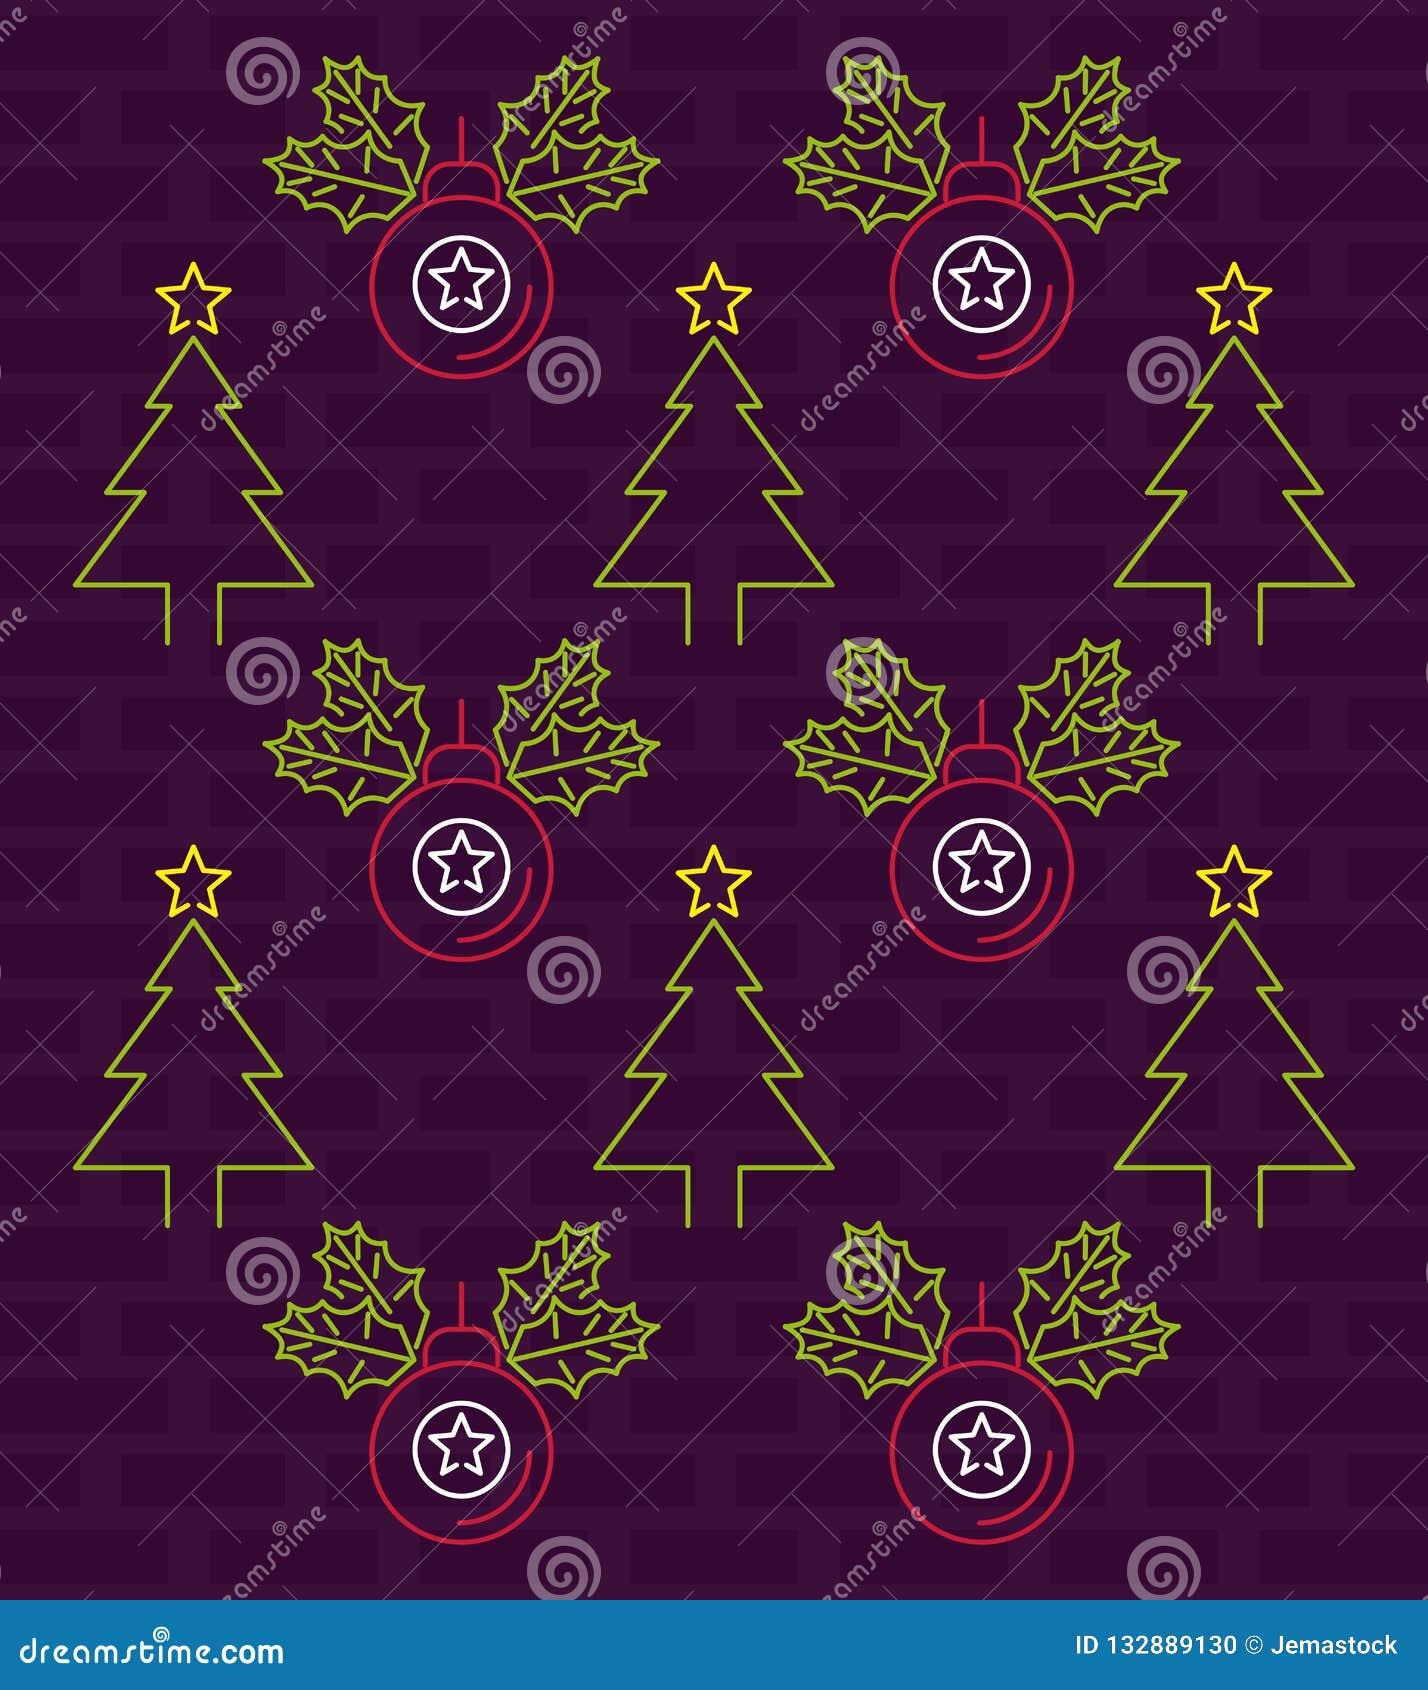 merry christmas wallpaper neon lights merry christmas wallpaper balls trees brick wall background vector illustration graphic 132889130